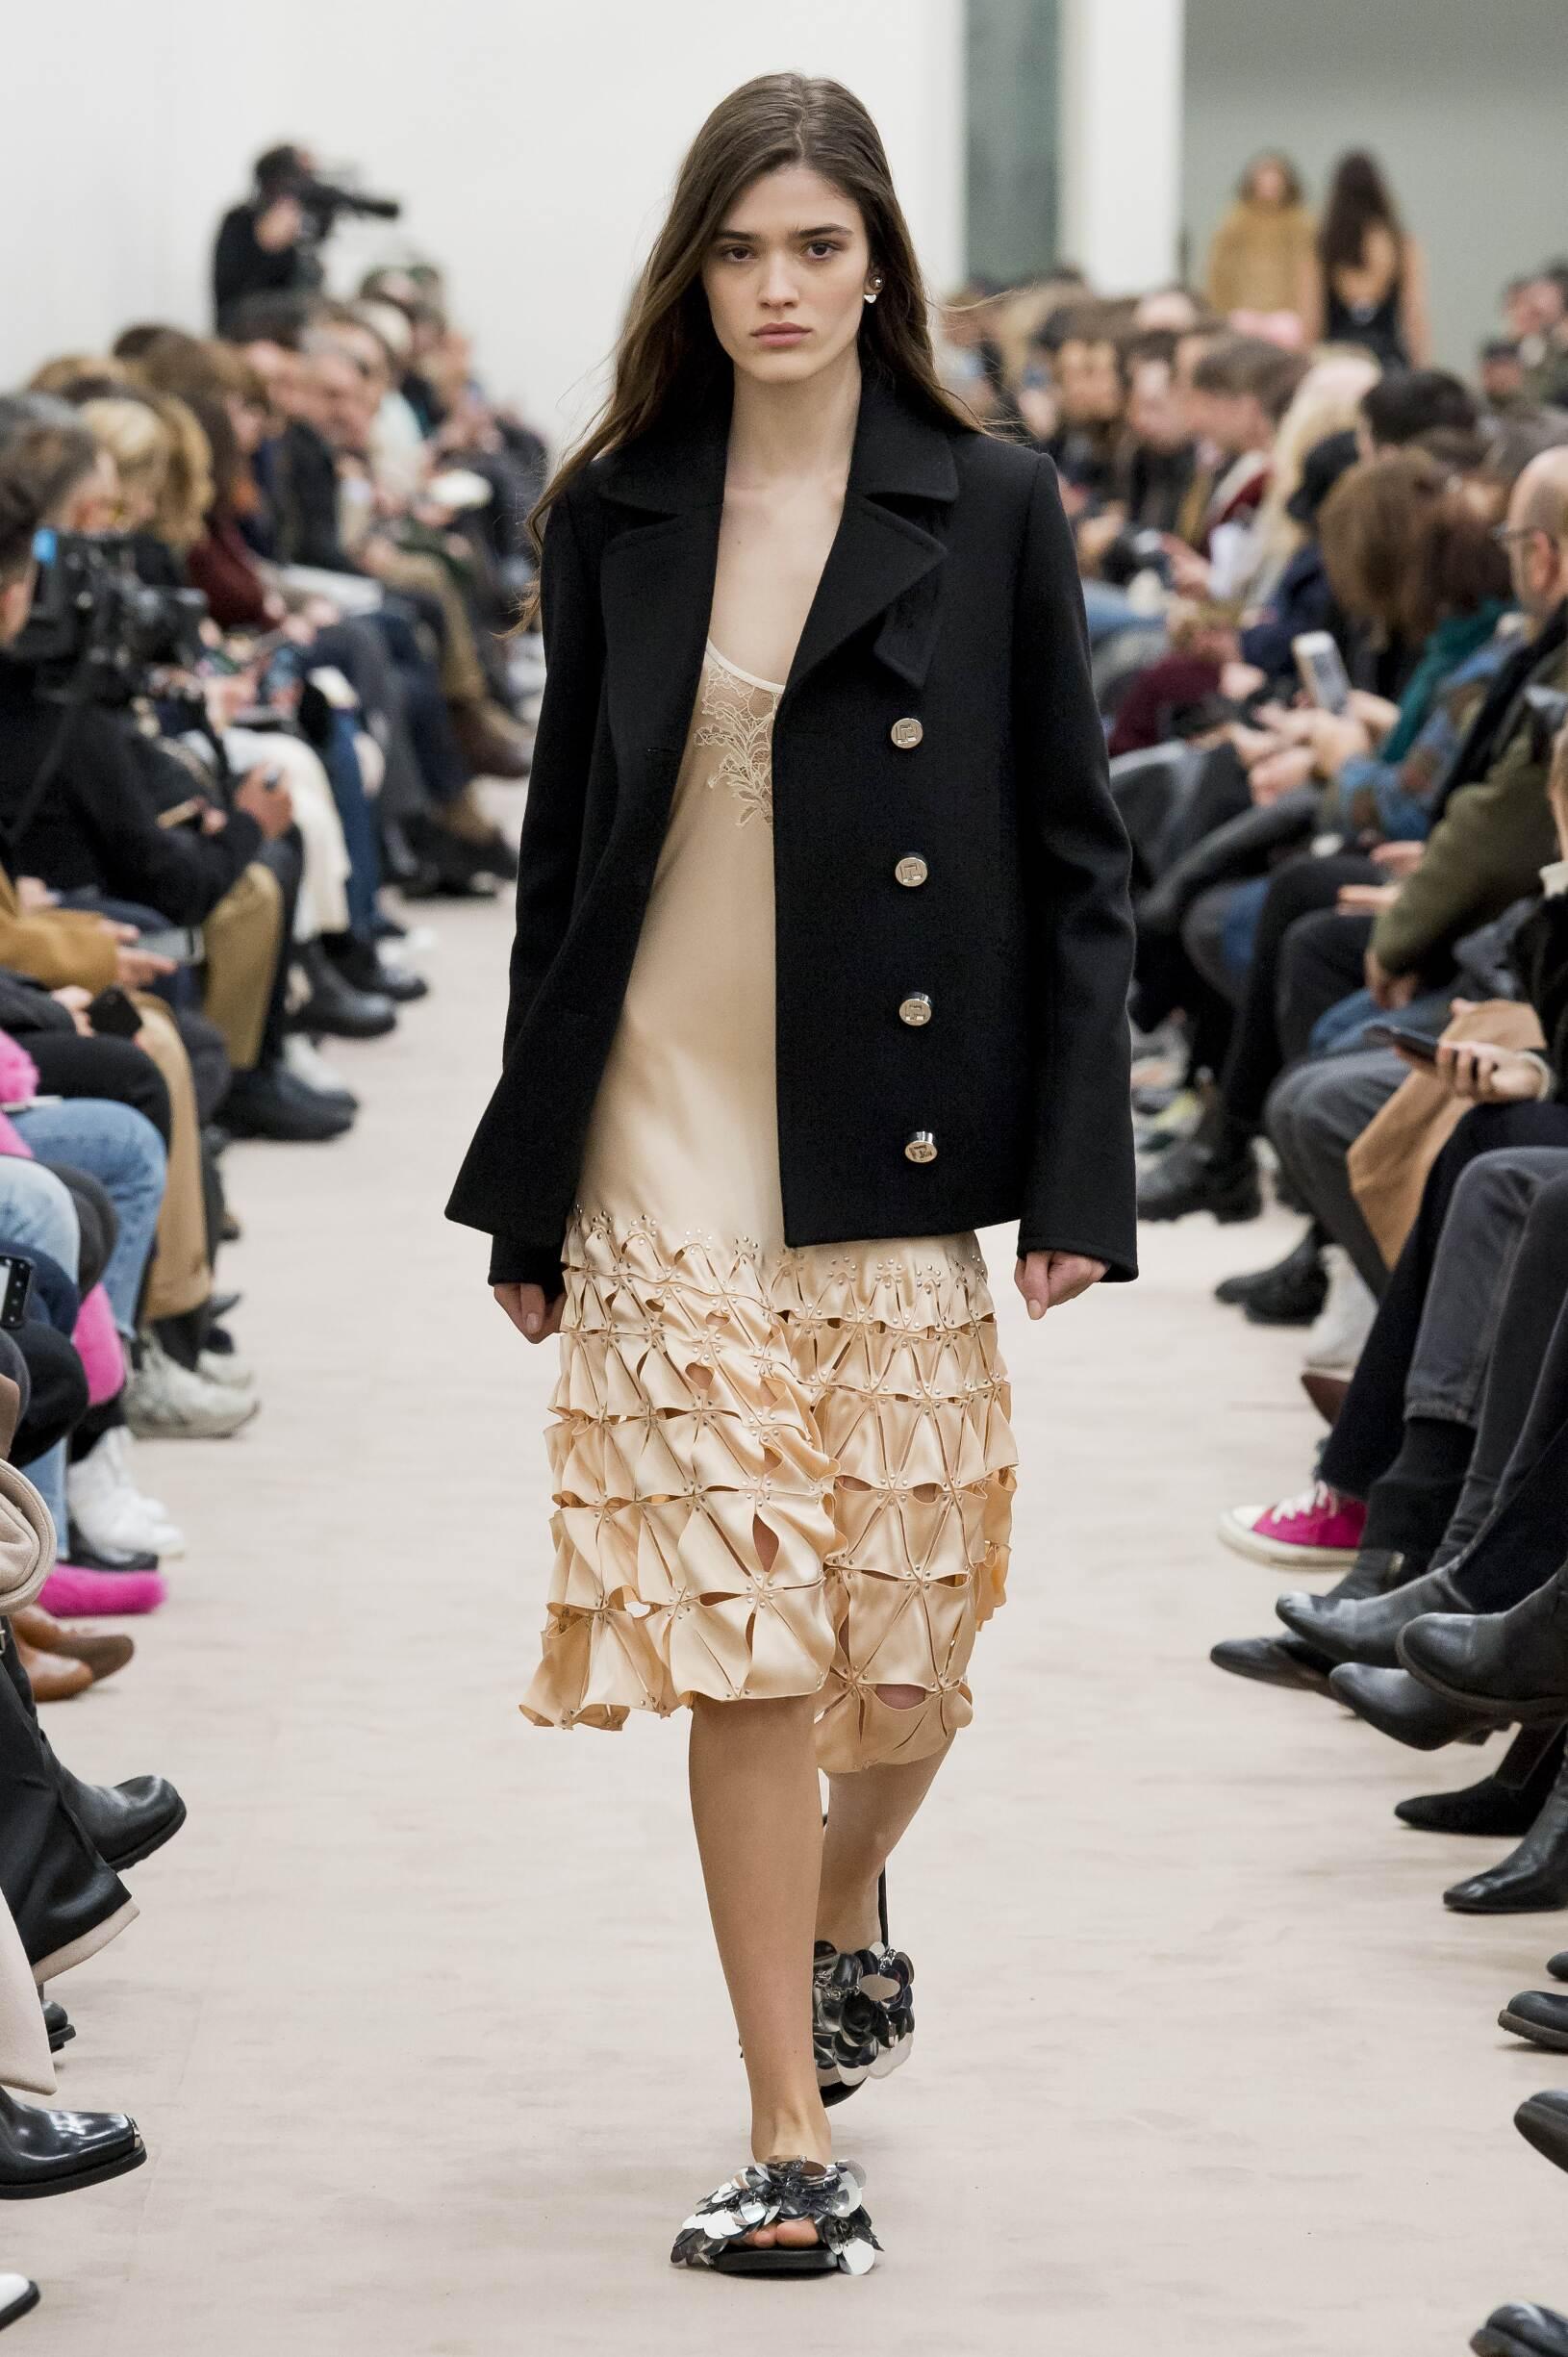 Catwalk Paco Rabanne Woman Fashion Show Winter 2018